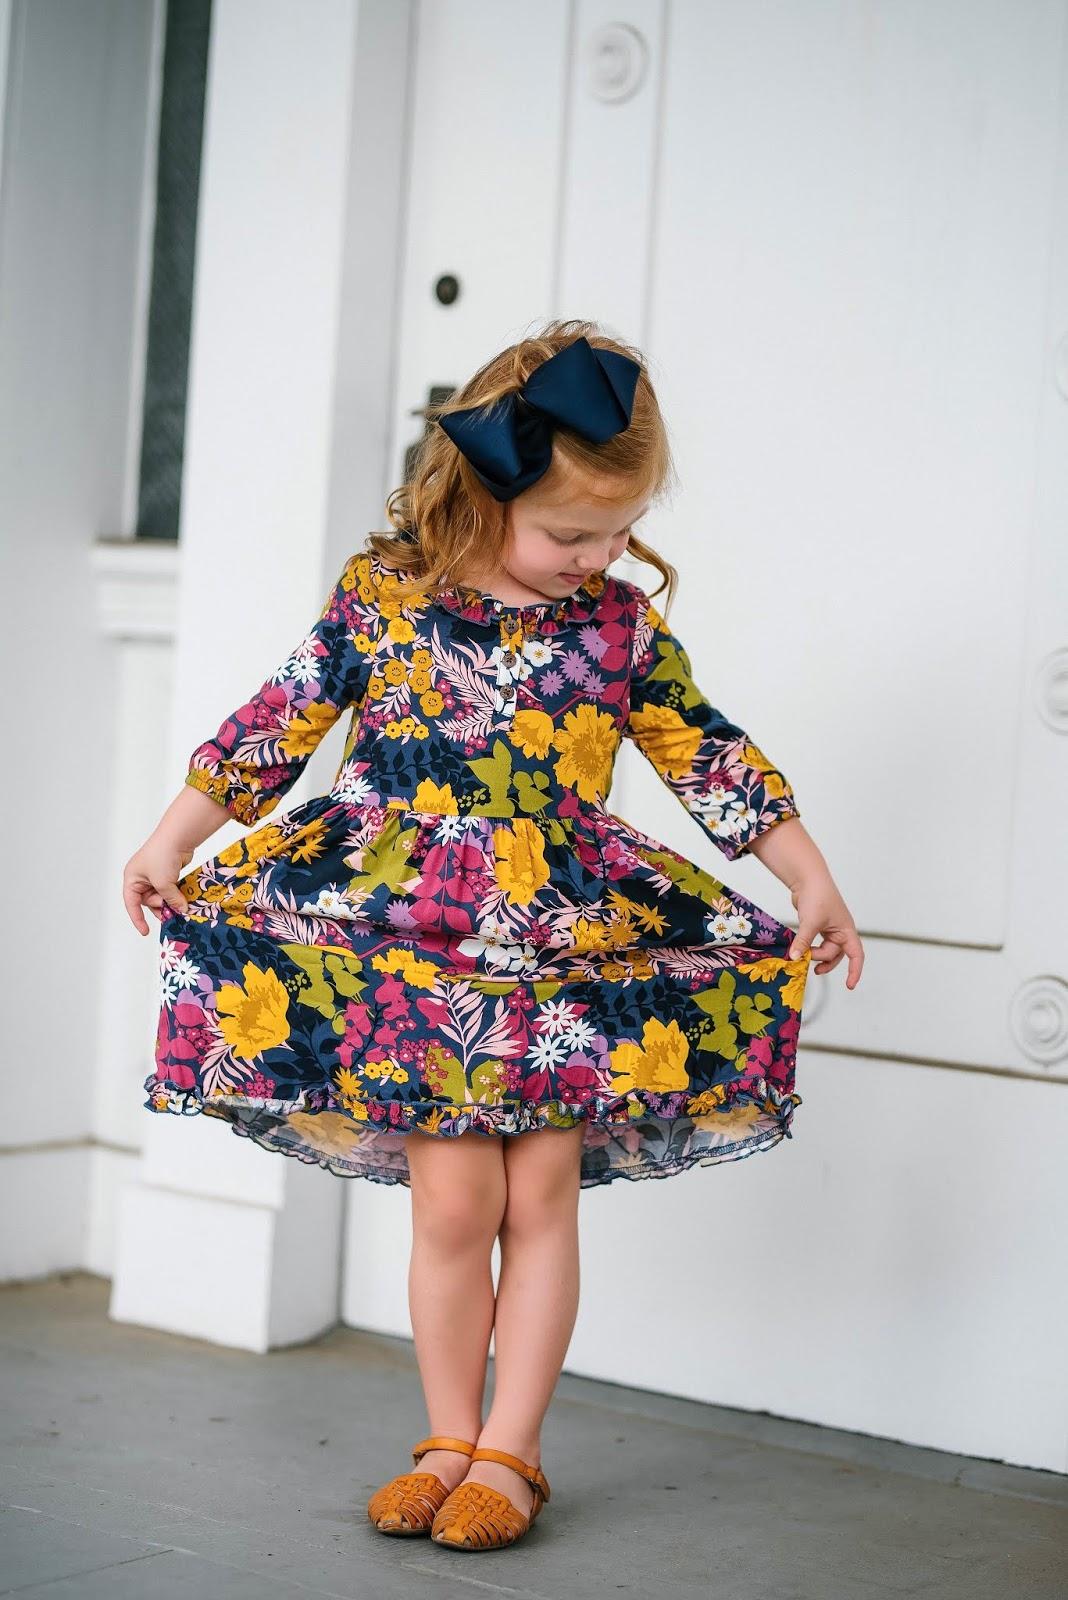 Mommy & Me Transition Looks: Target Style! - Something Delightful Blog @racheltimmerman